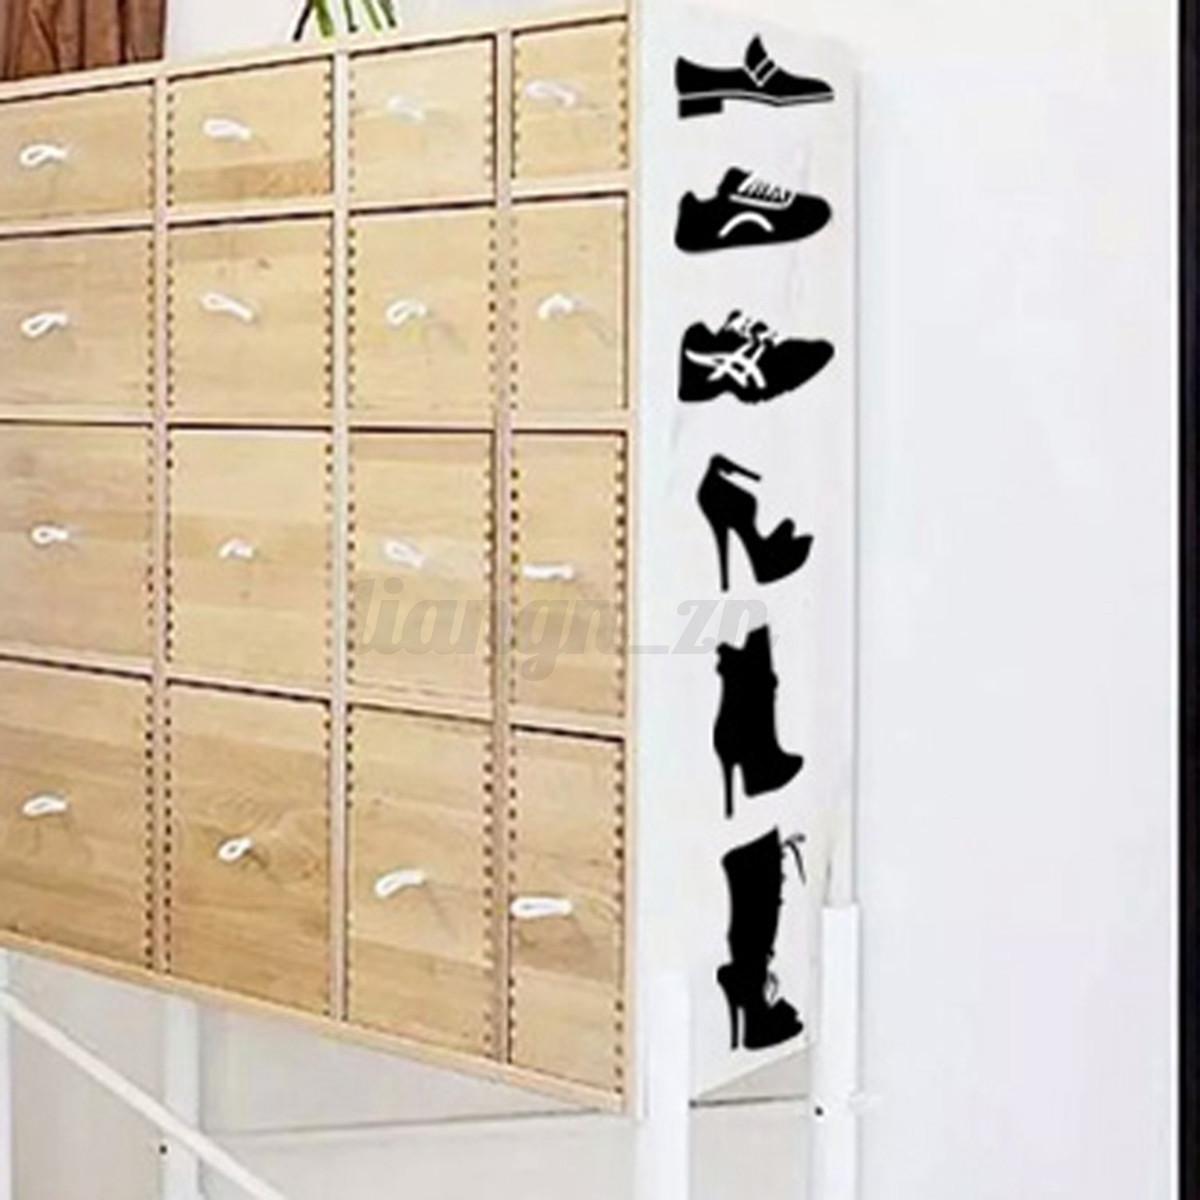 sticker armoire chaussures mural autocollant meuble tiquette label d coration ebay. Black Bedroom Furniture Sets. Home Design Ideas